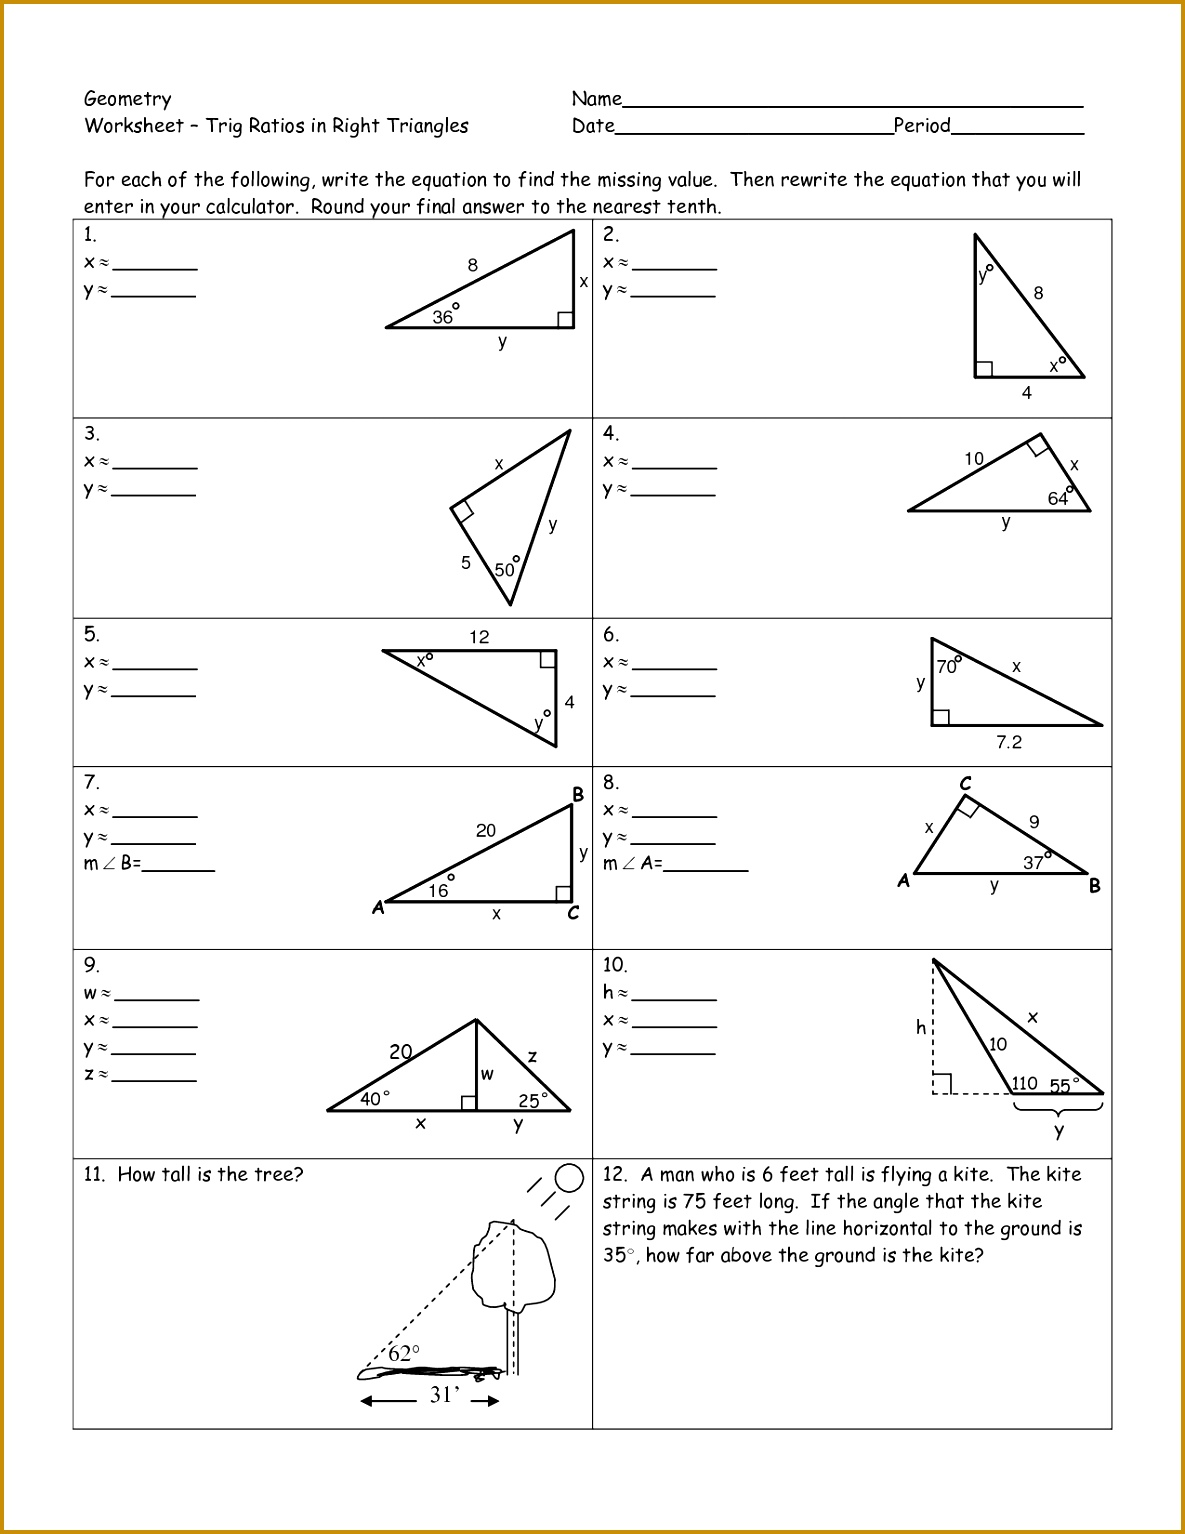 Worksheet Trigonometric Ratios Answers - Adriaticatoursrl